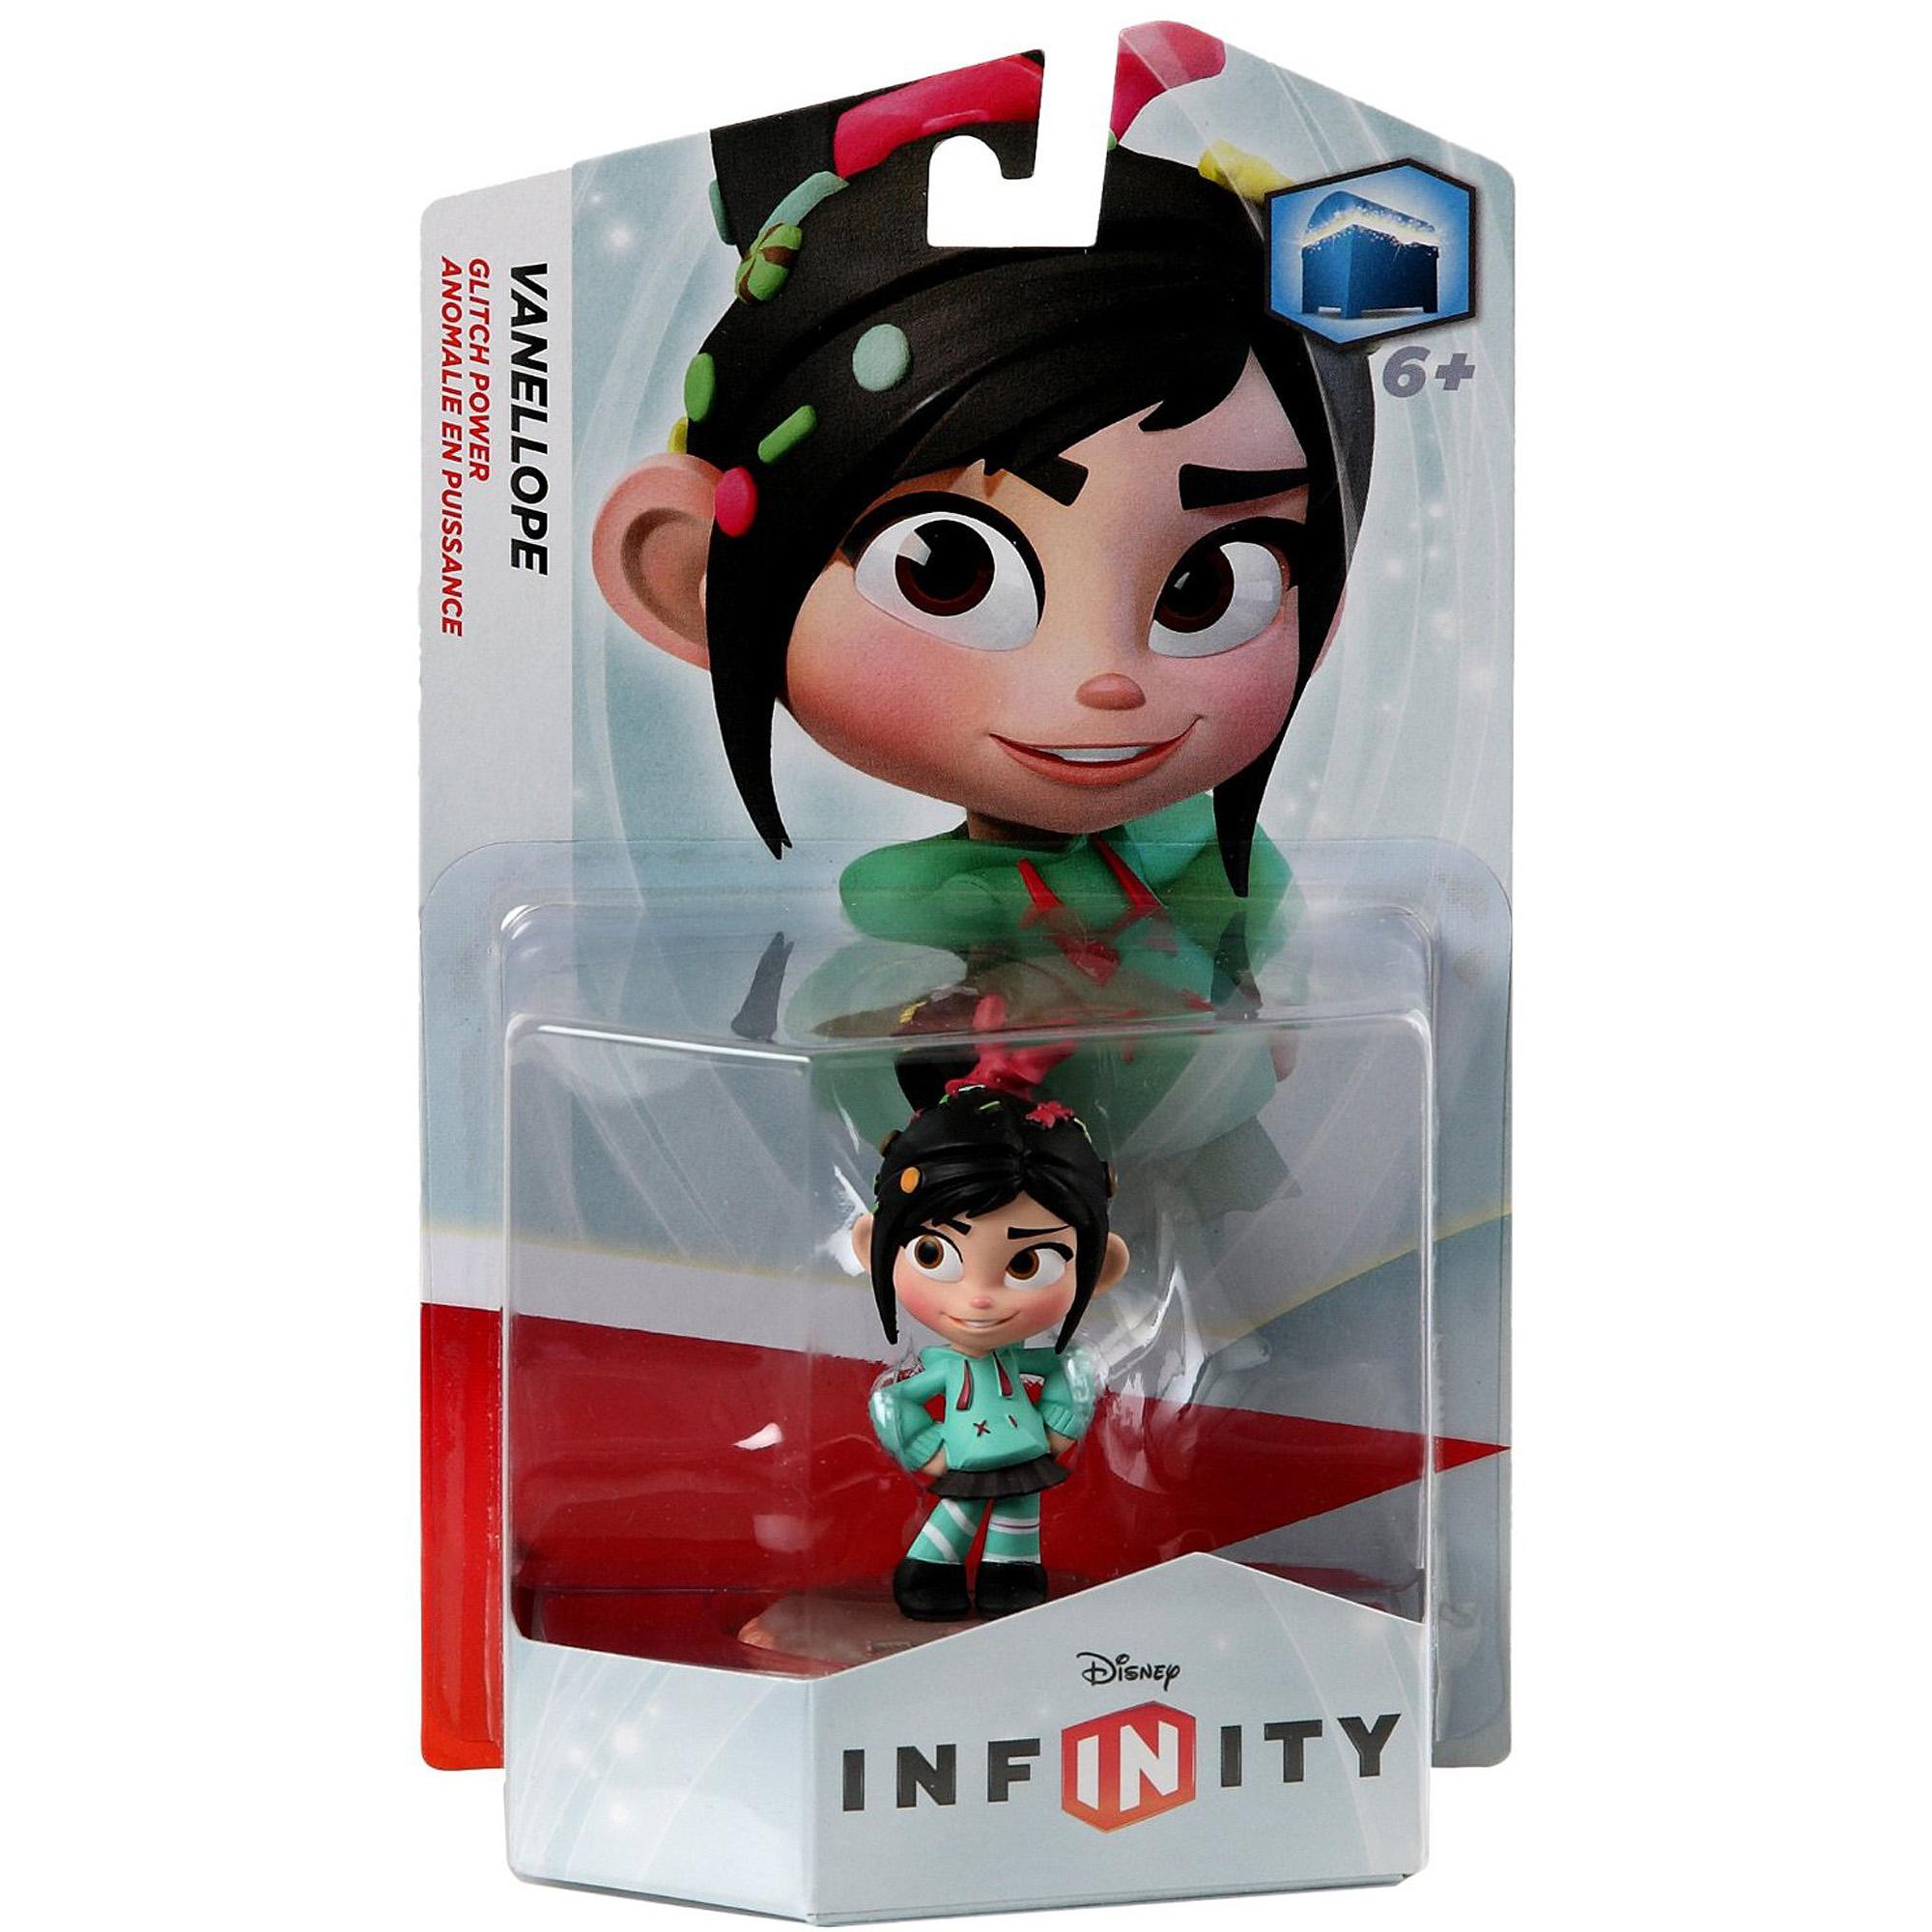 Disney Infinity Figure - Vanellope